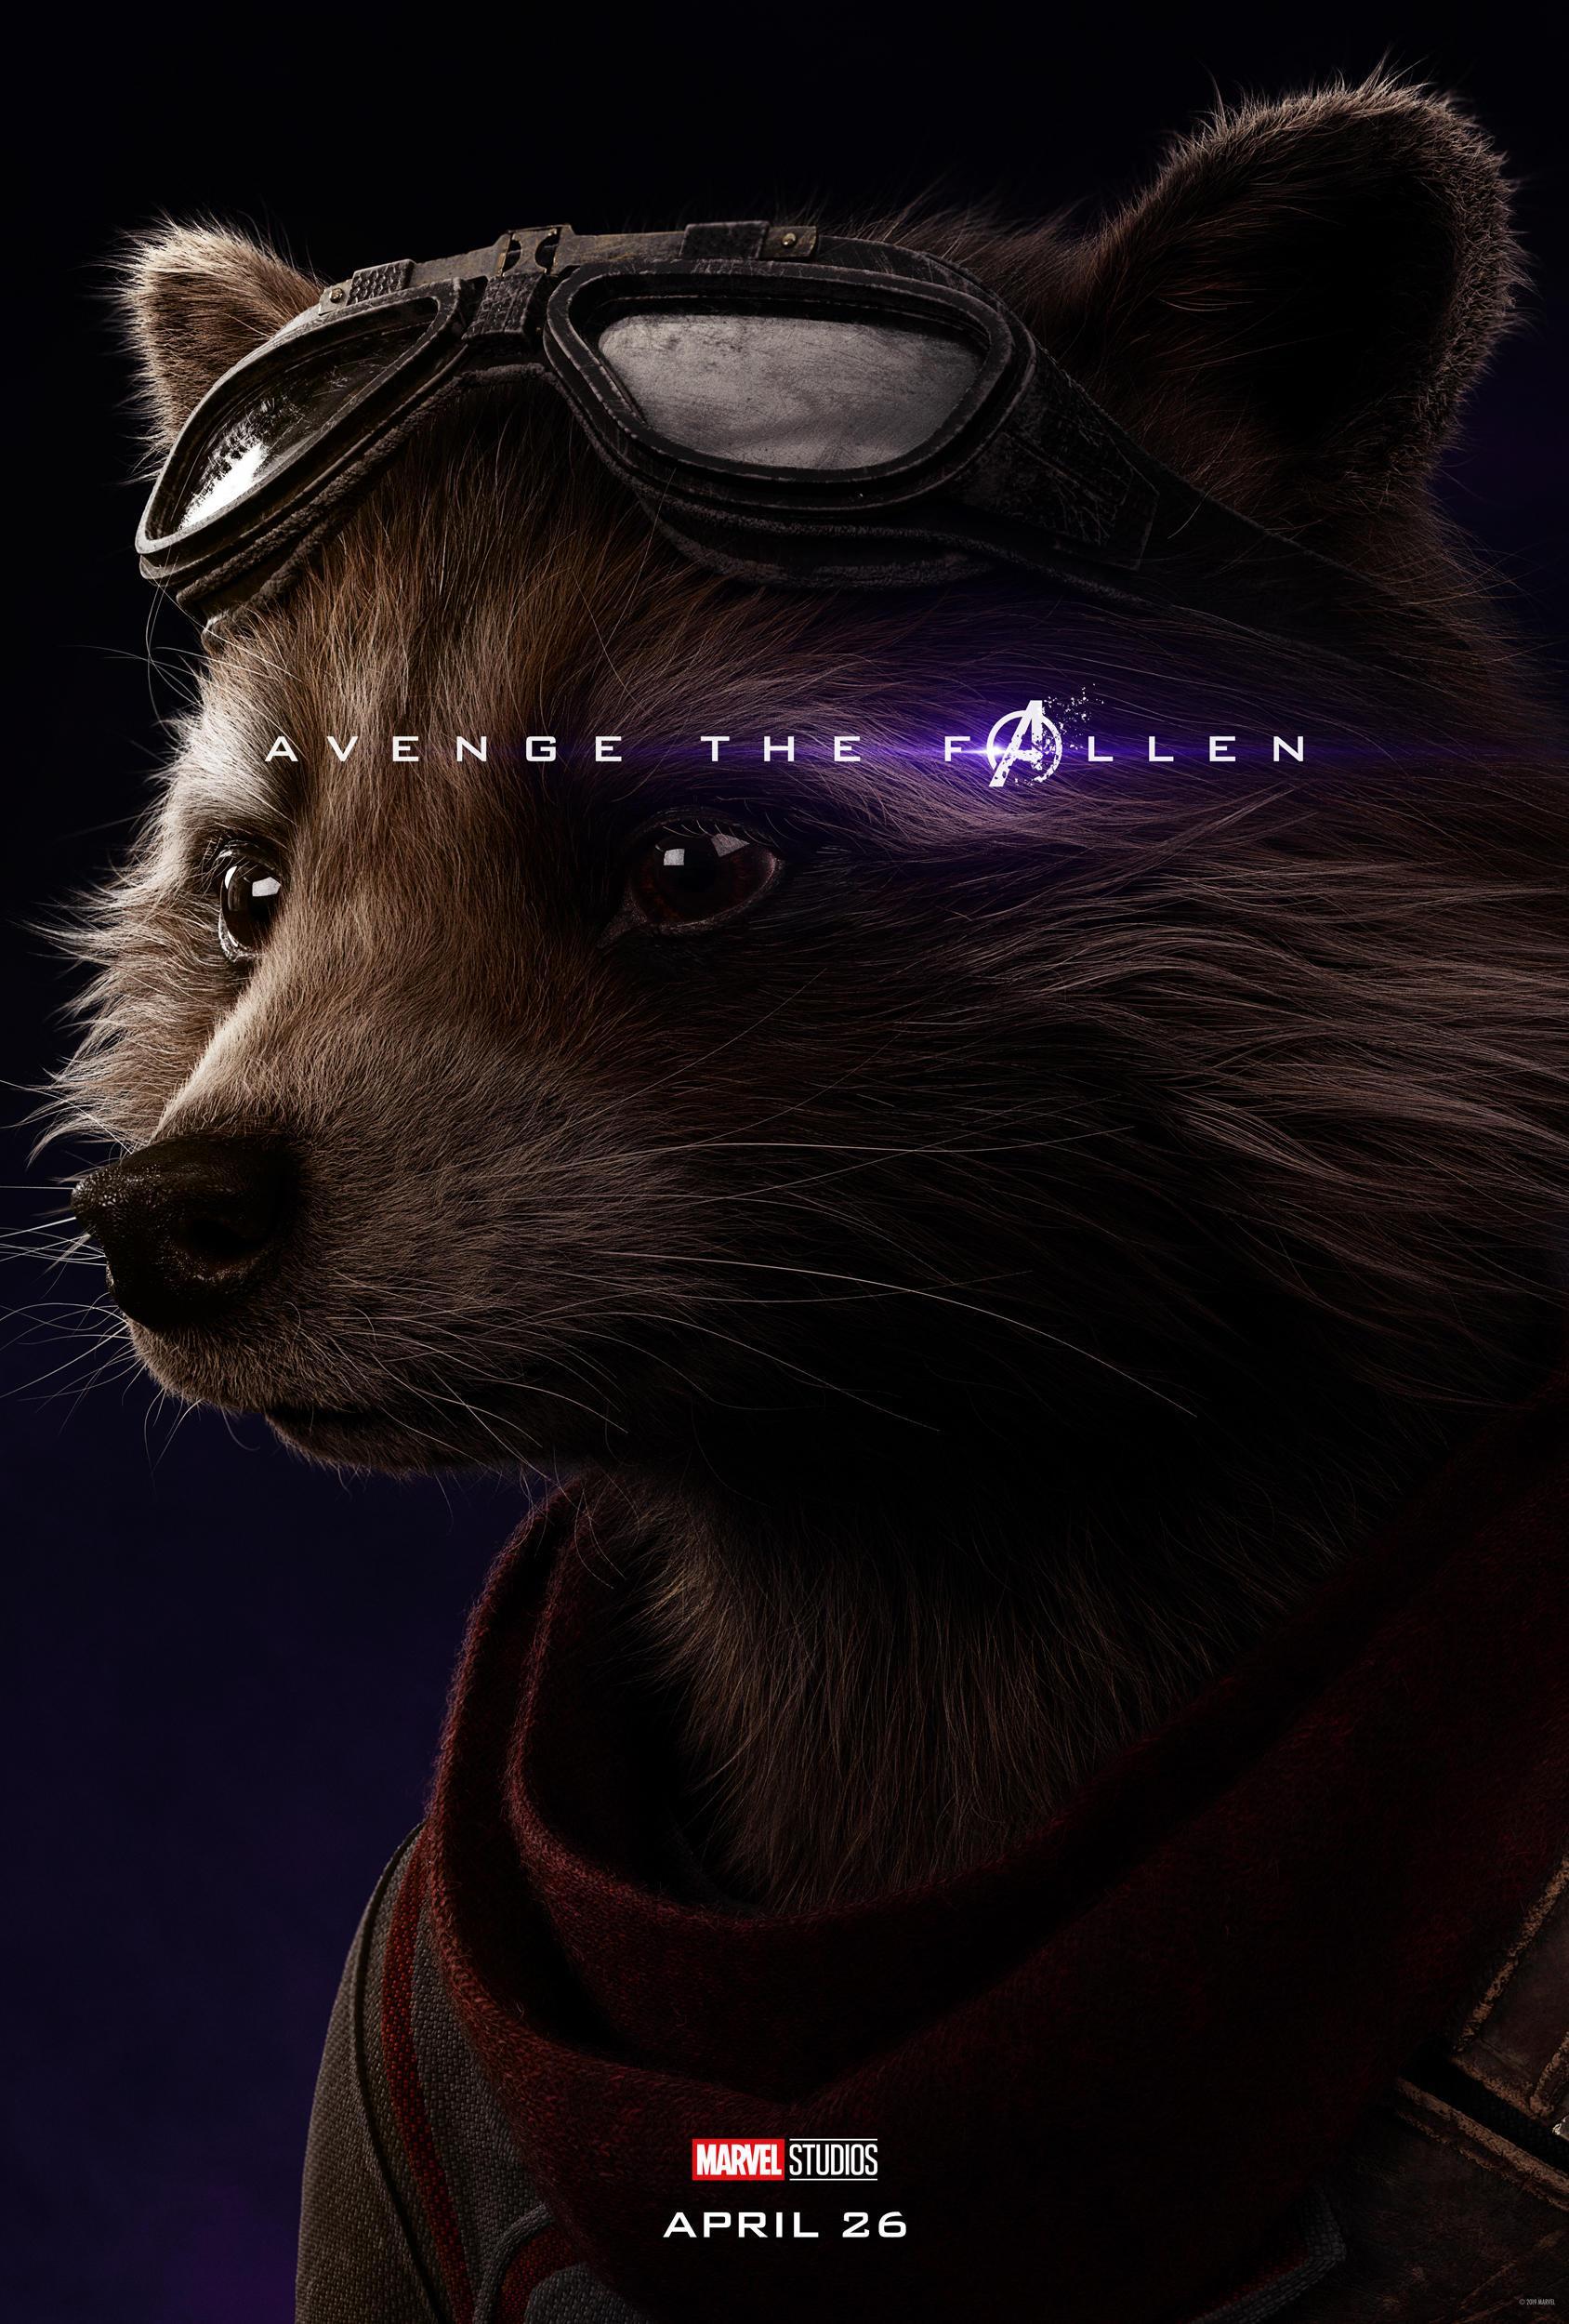 MCU recap ahead of Avengers: Endgame: What happens in every